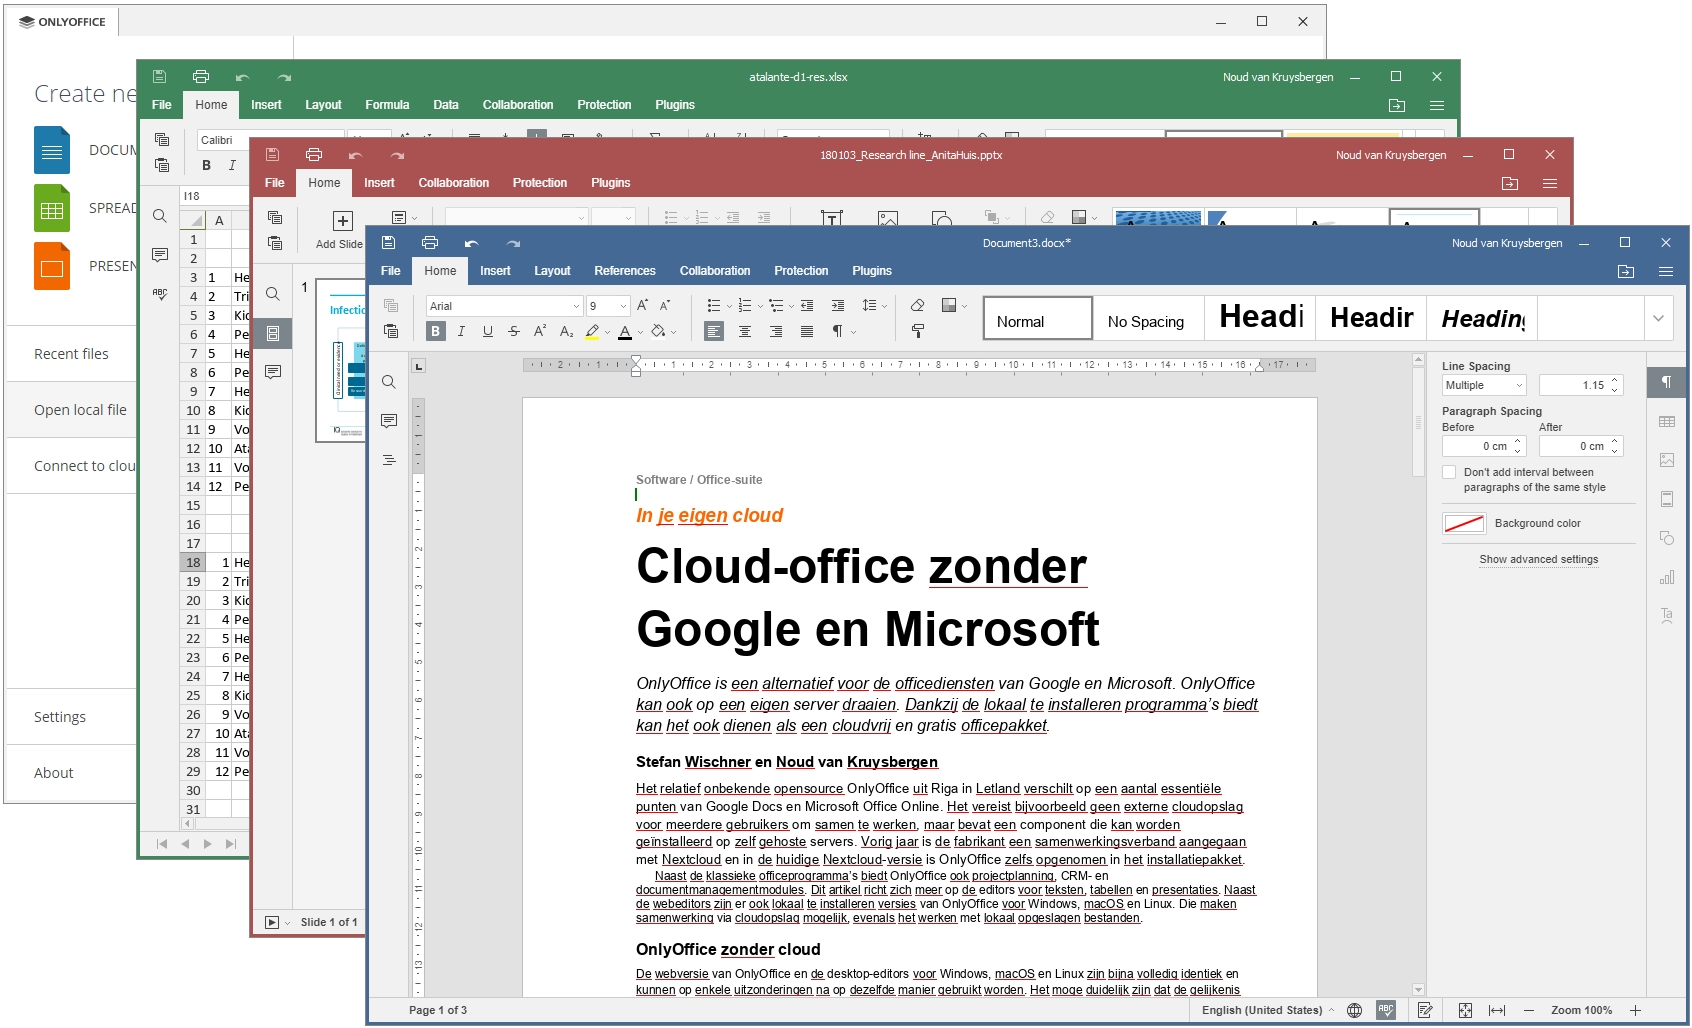 gratis Microsoft Office alternatief OnlyOffice